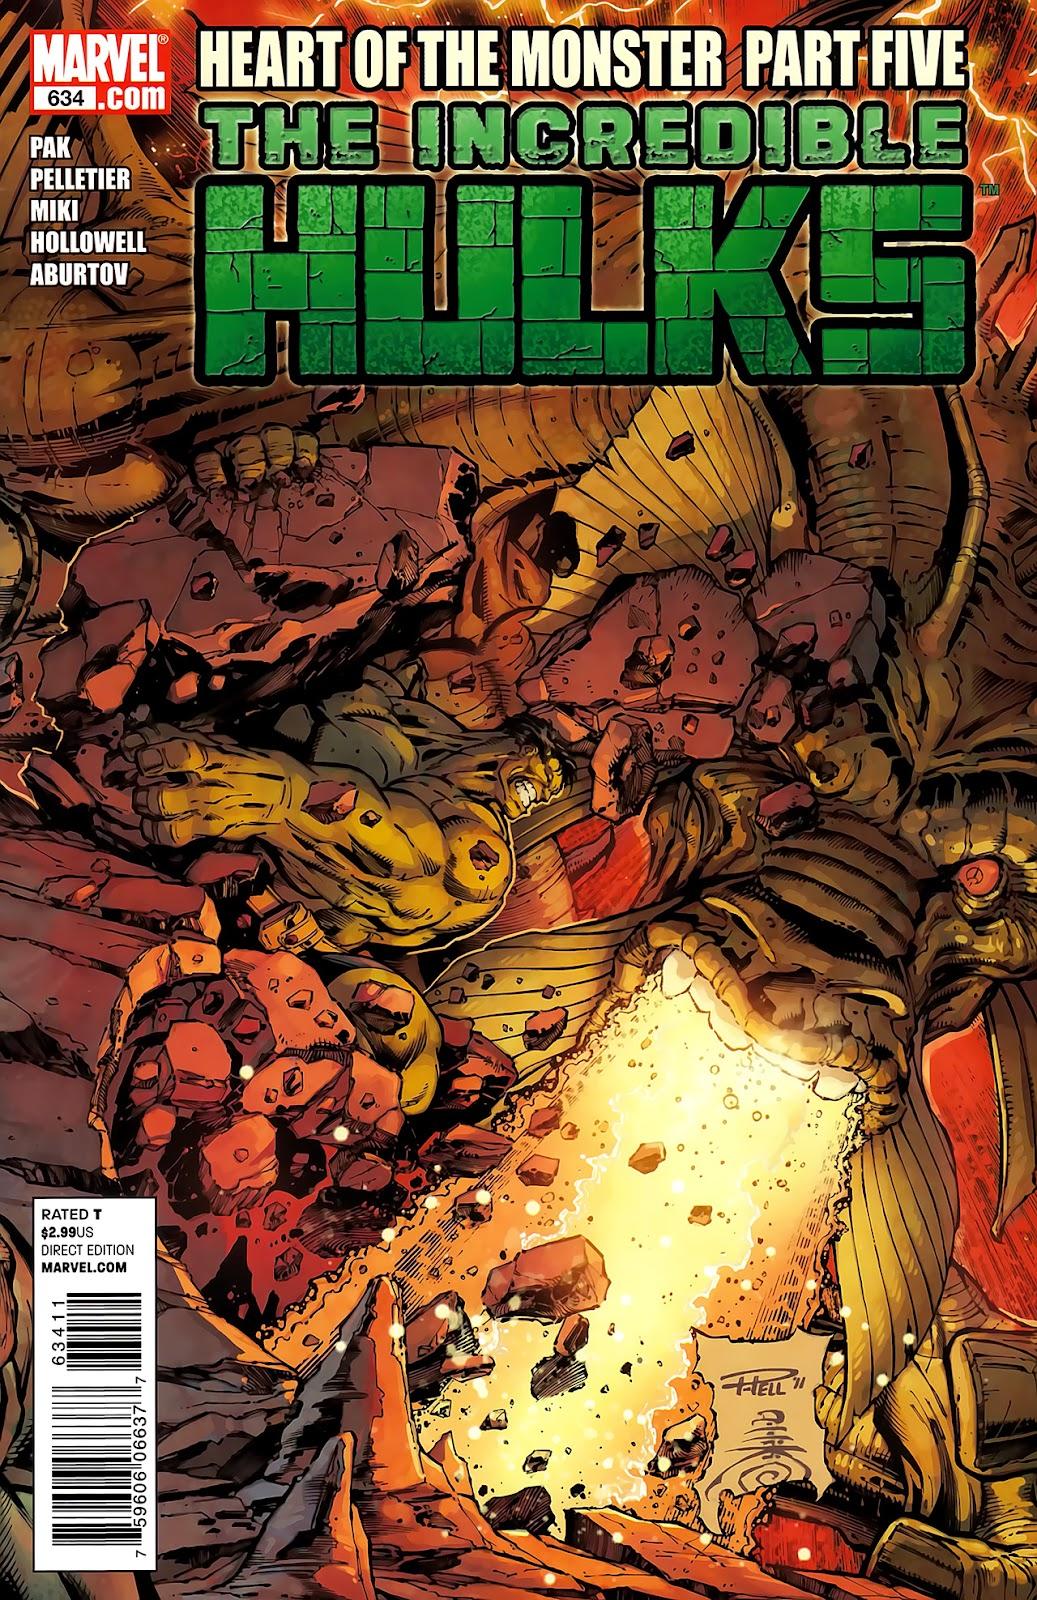 Incredible Hulks (2010) Issue #634 #24 - English 1